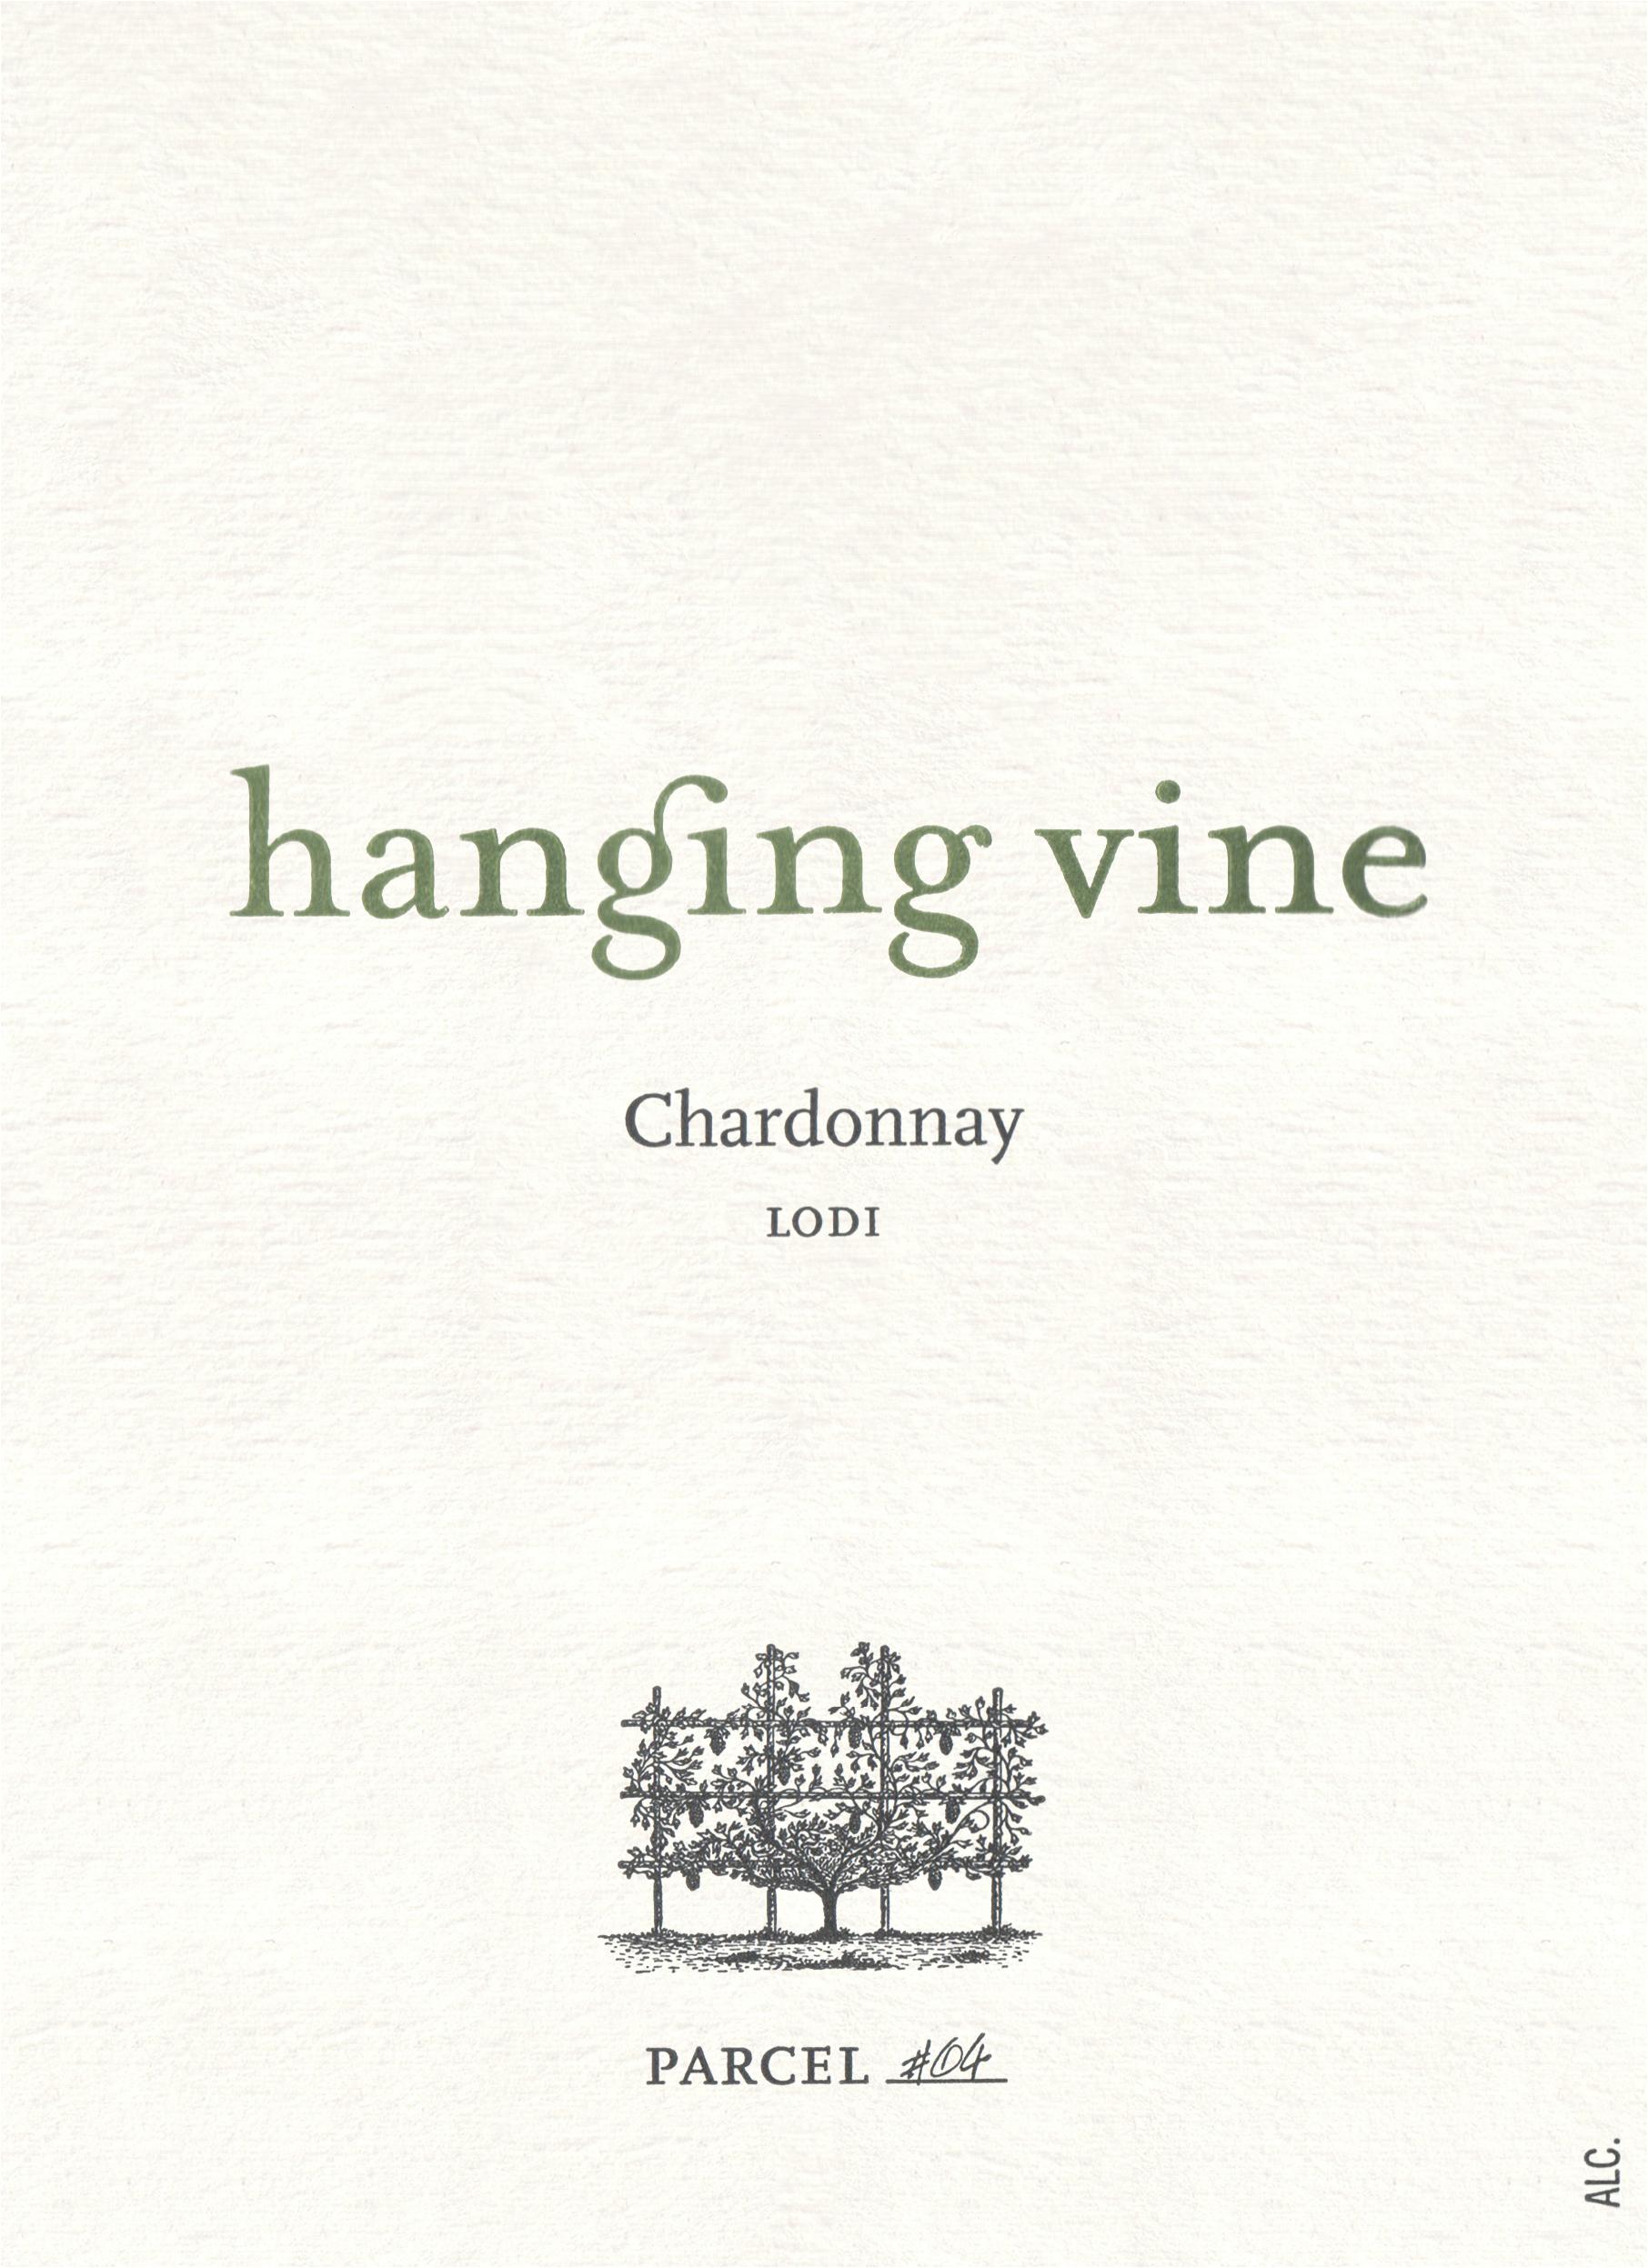 Hanging Vine Chardonnay Lodi 2017